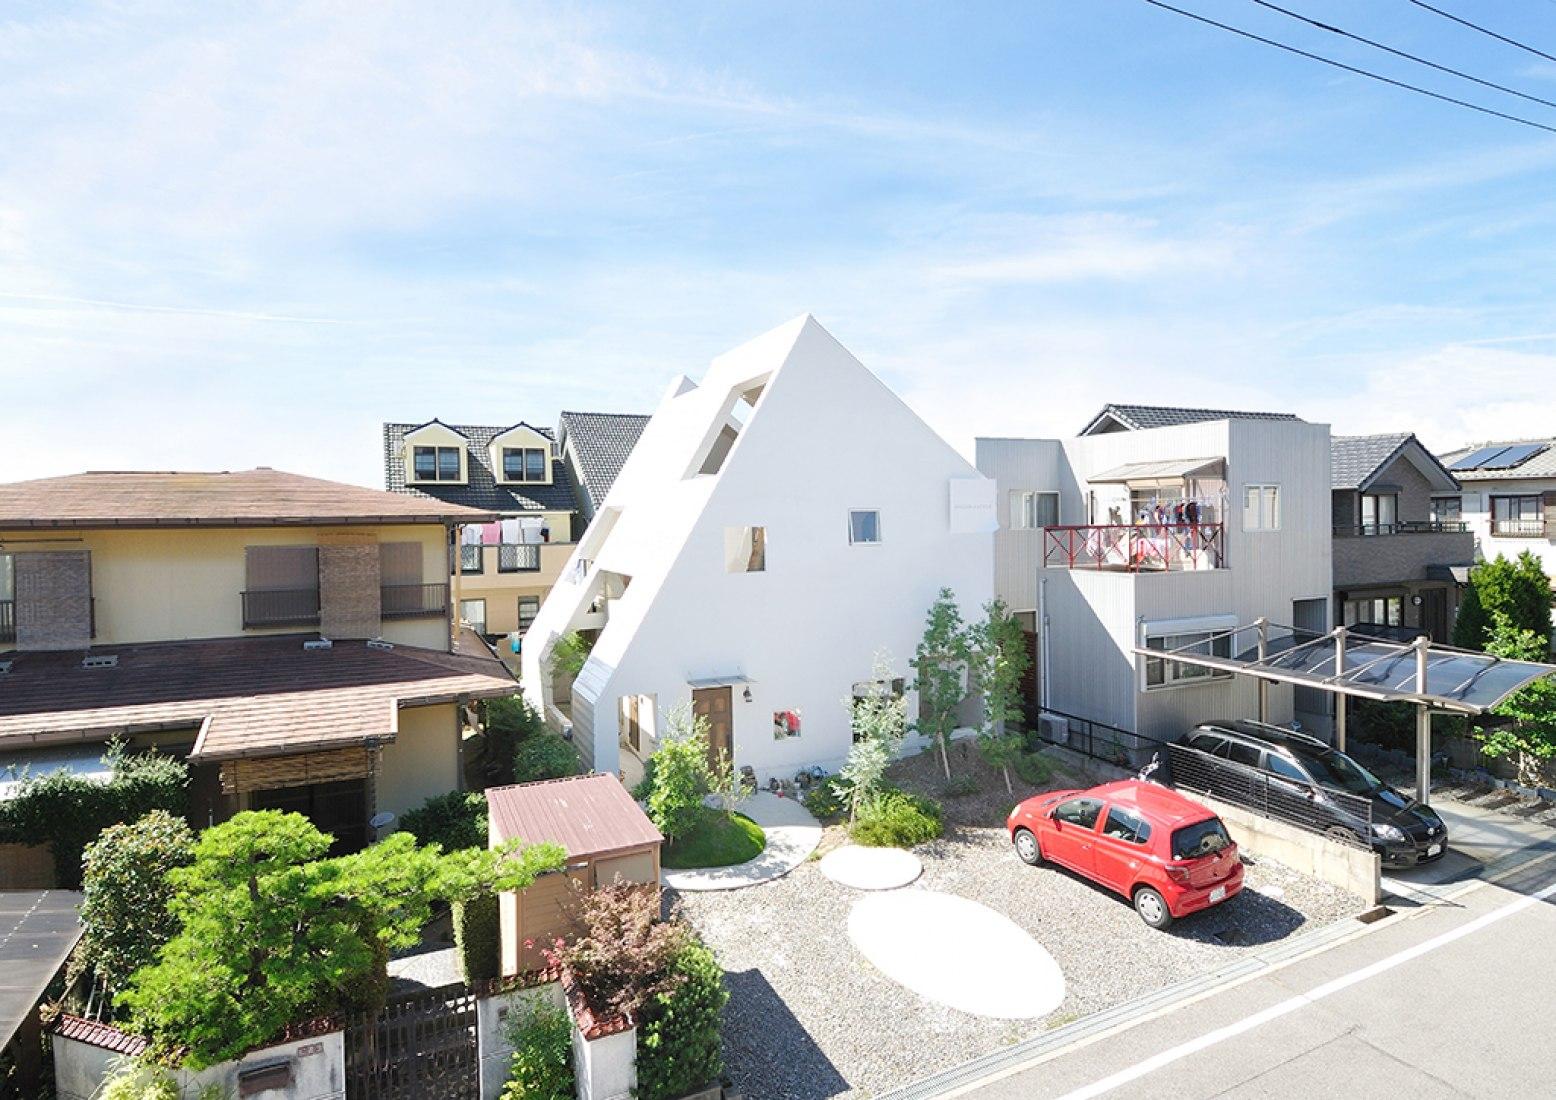 Montblanc House por Studio Velocity. Fotografía © Kentaro Kurihara.